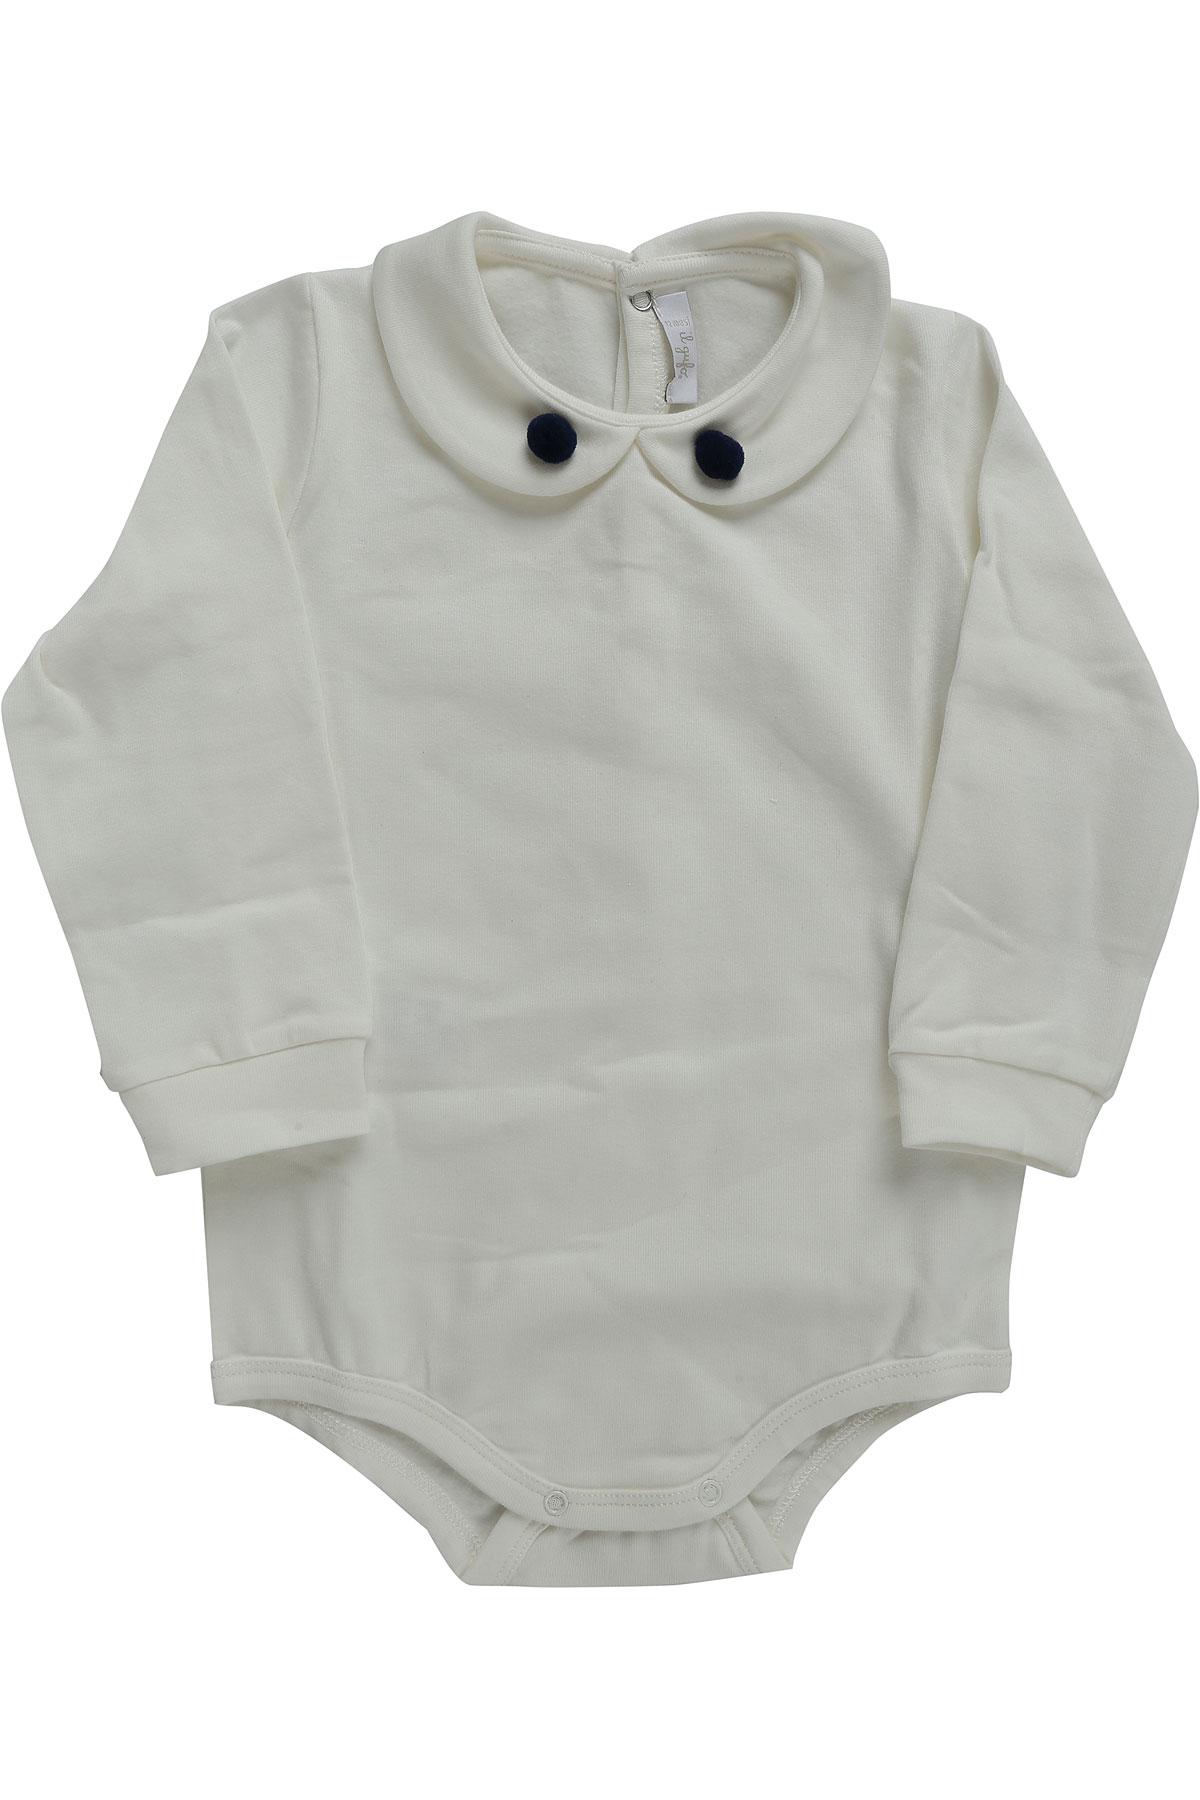 Image of Il Gufo Baby Suits On Sale, White, Cotton, 2017, 12M 6M 9M